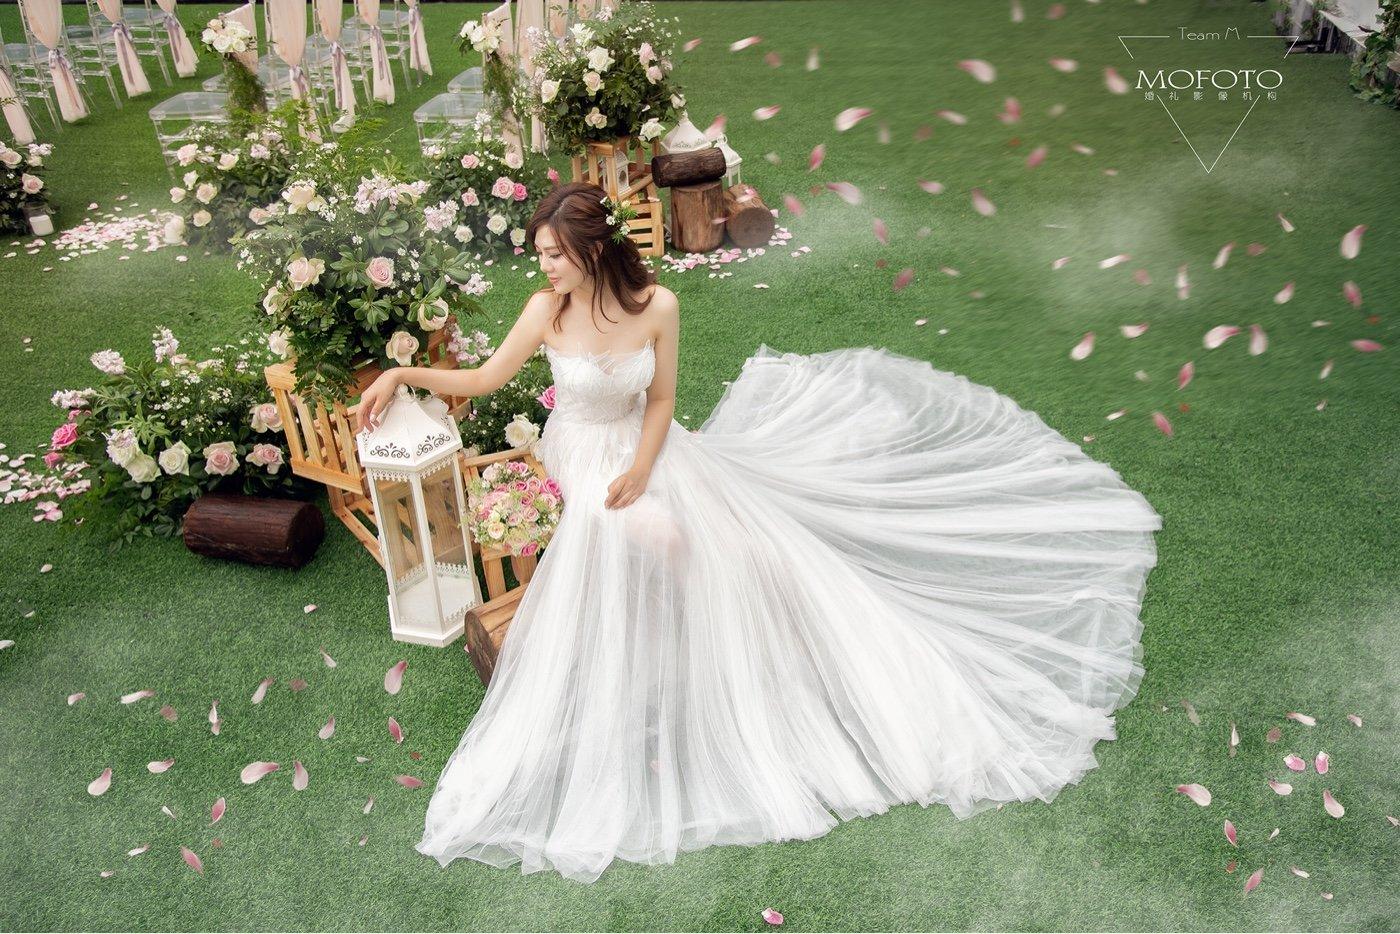 MoFoTo 婚礼拍摄9